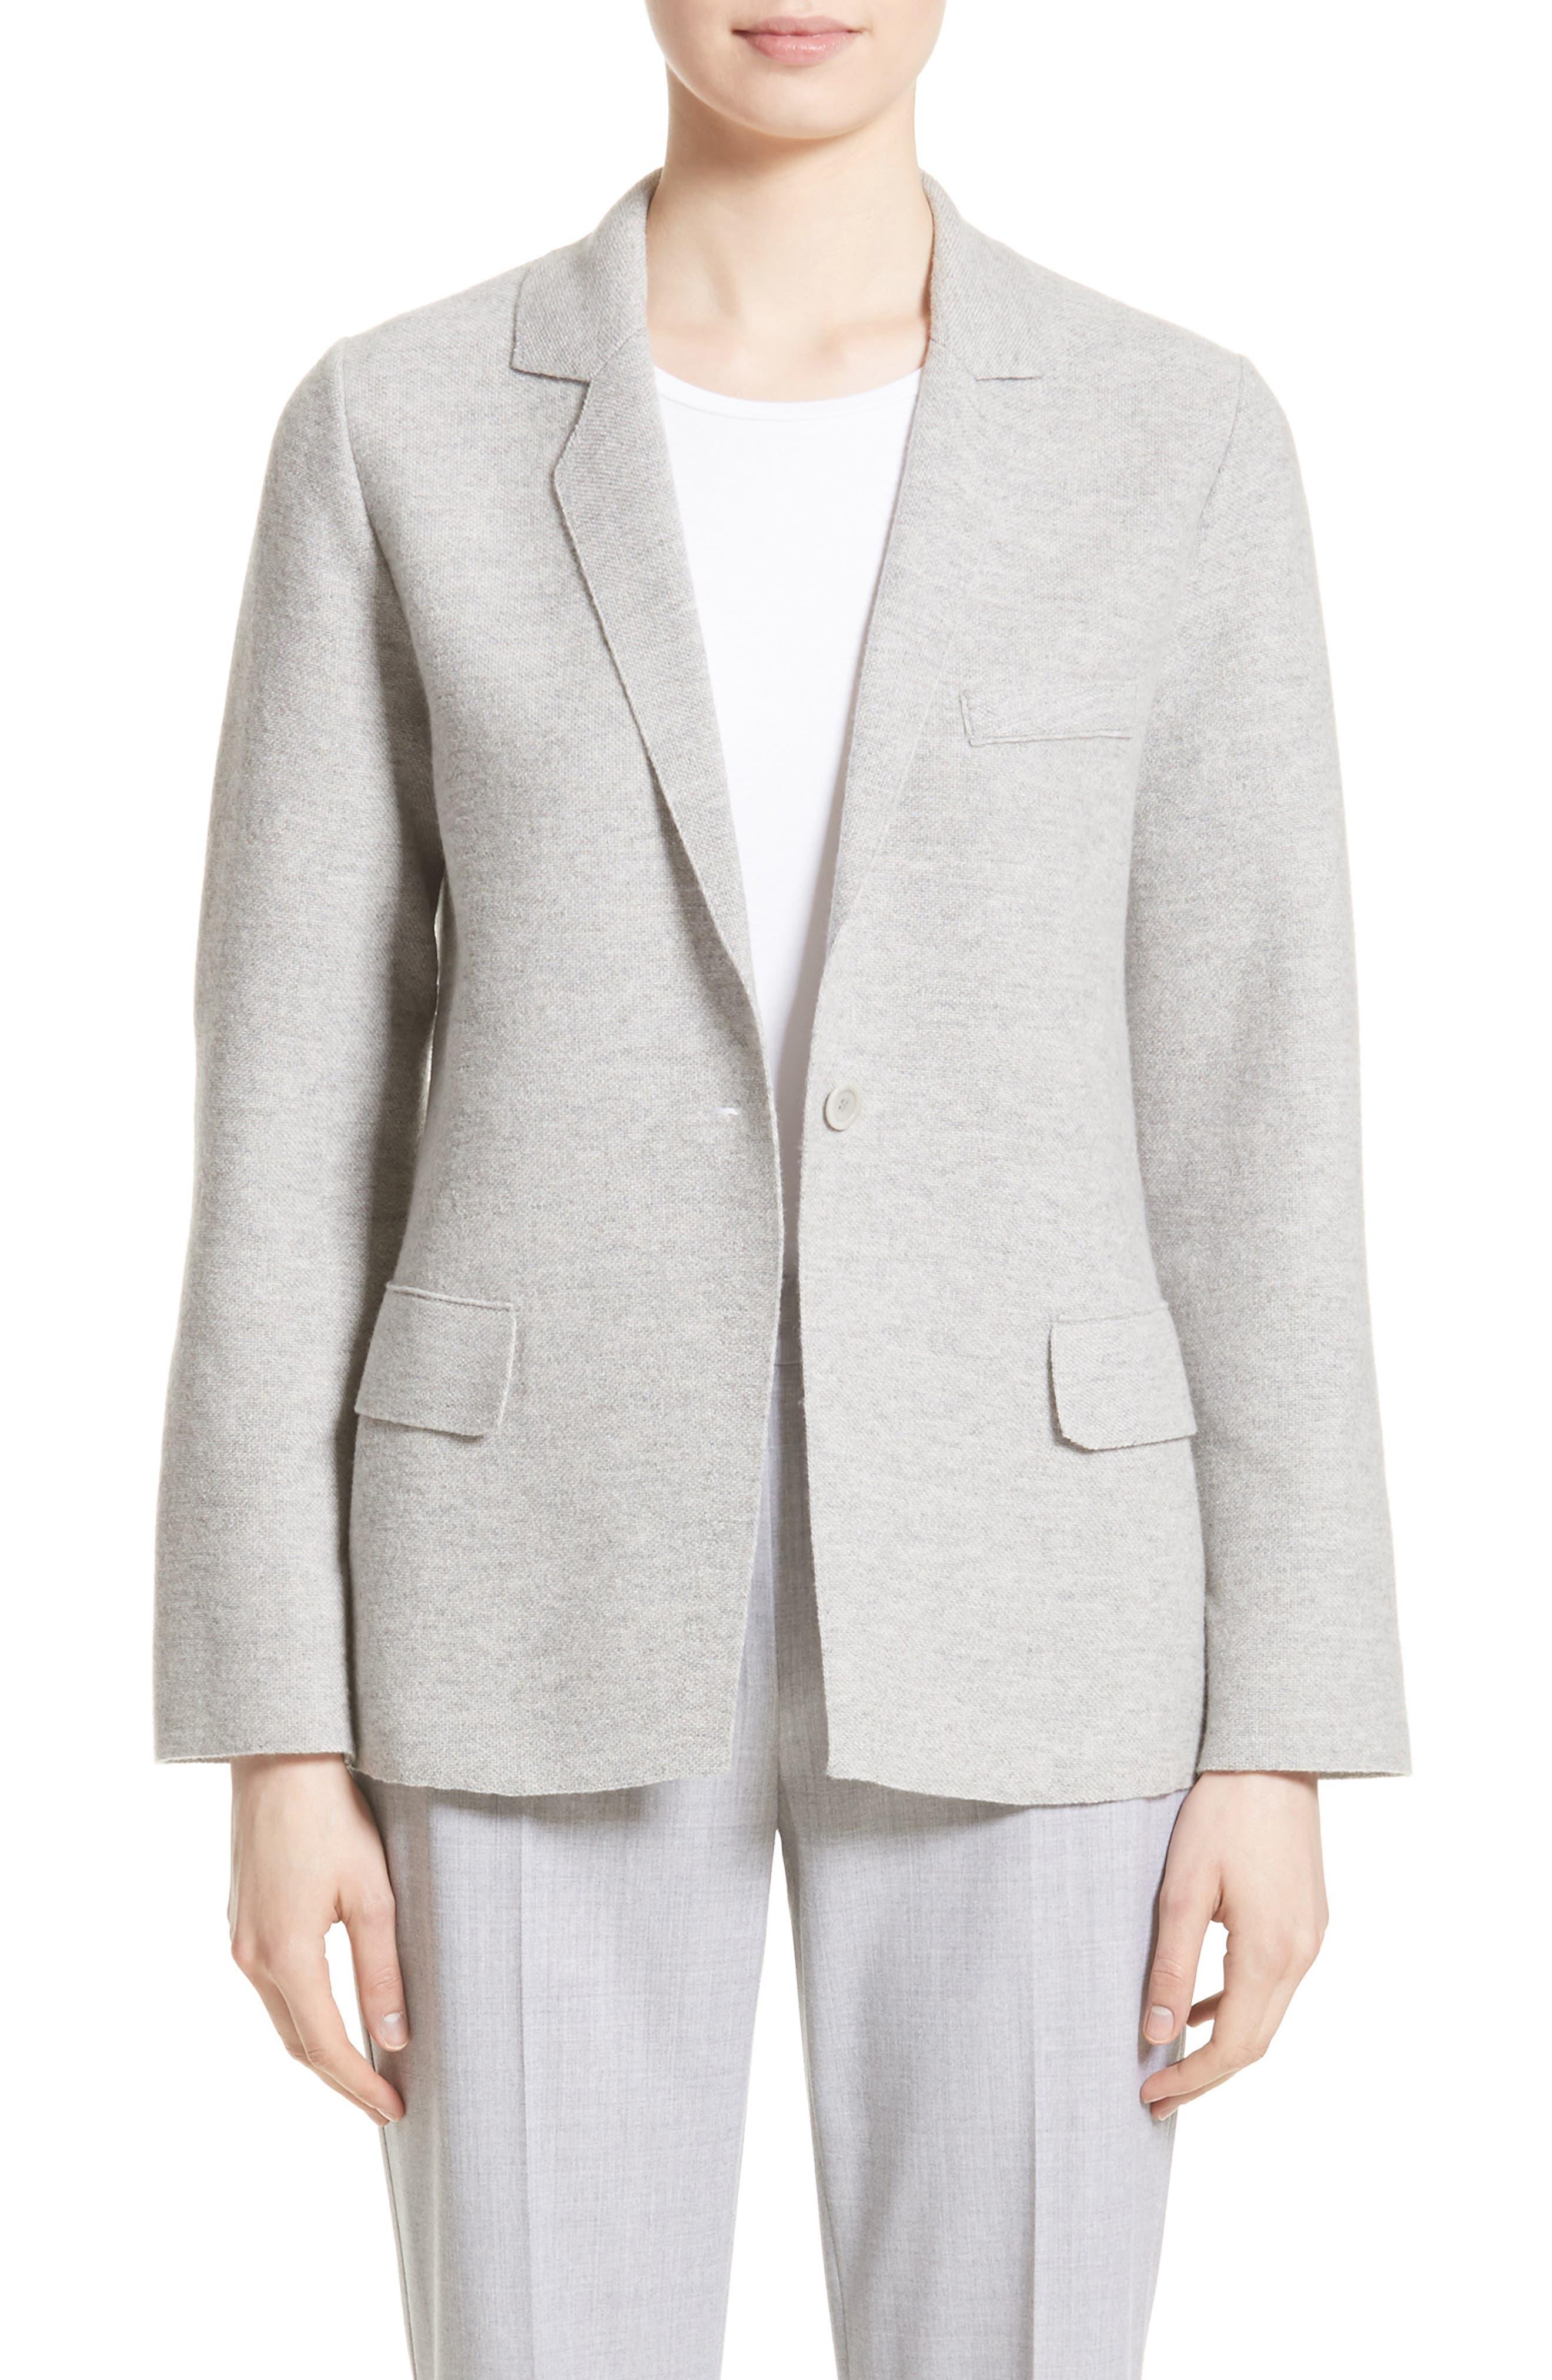 Max Mara Segnale Cashmere Jacket